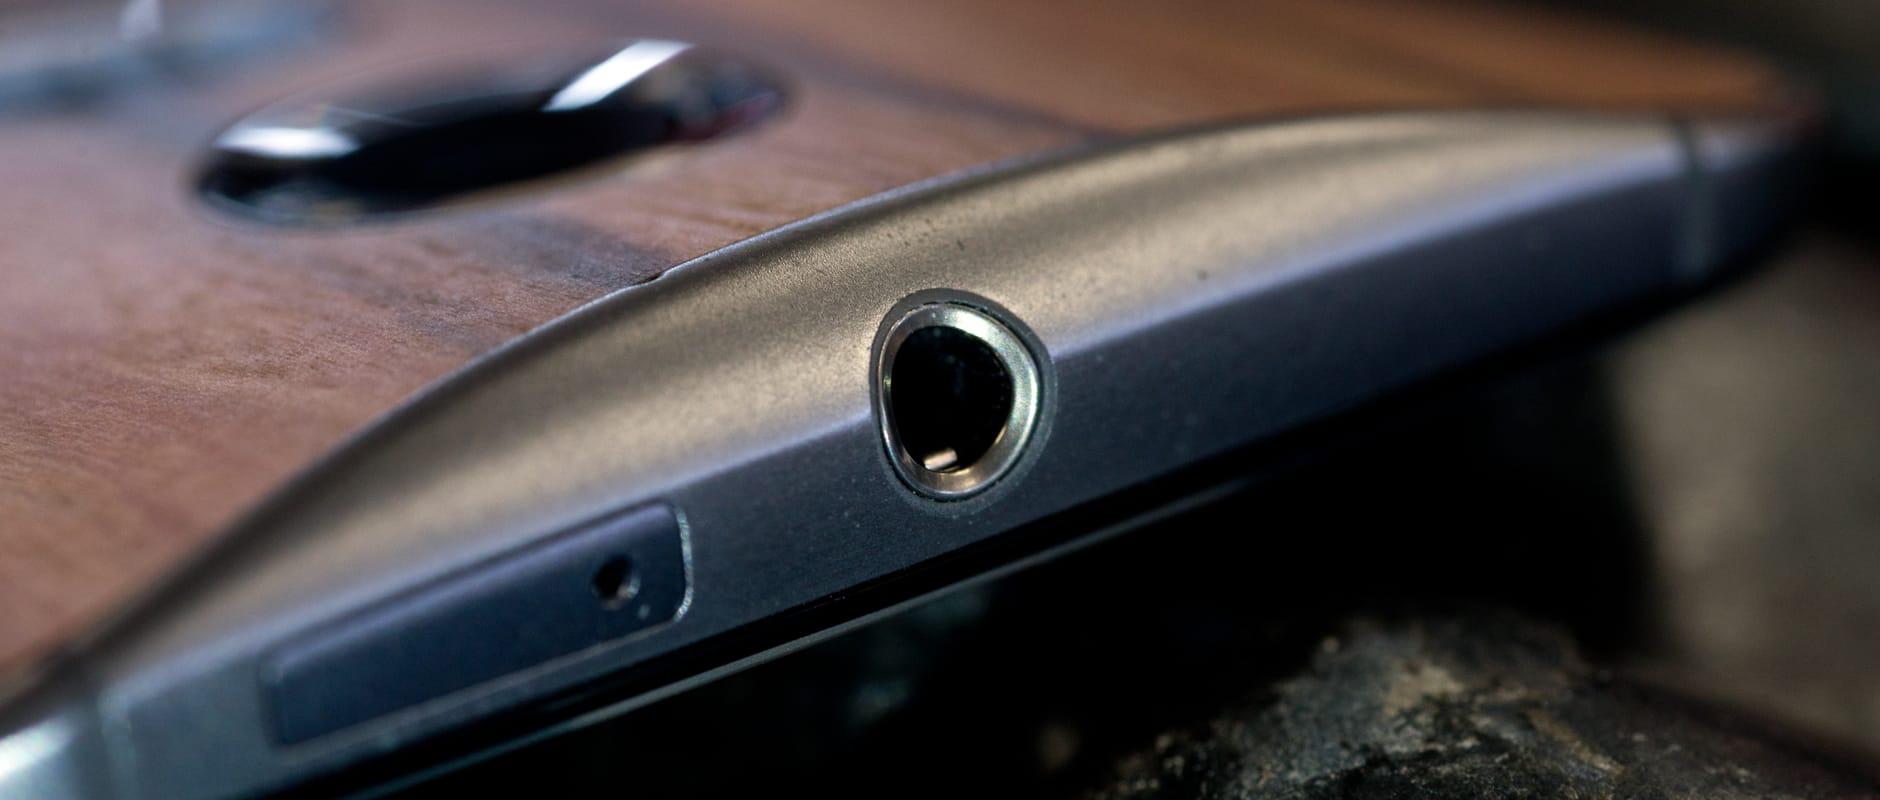 The headphone jack of the Motorola Moto X (2014 edition)